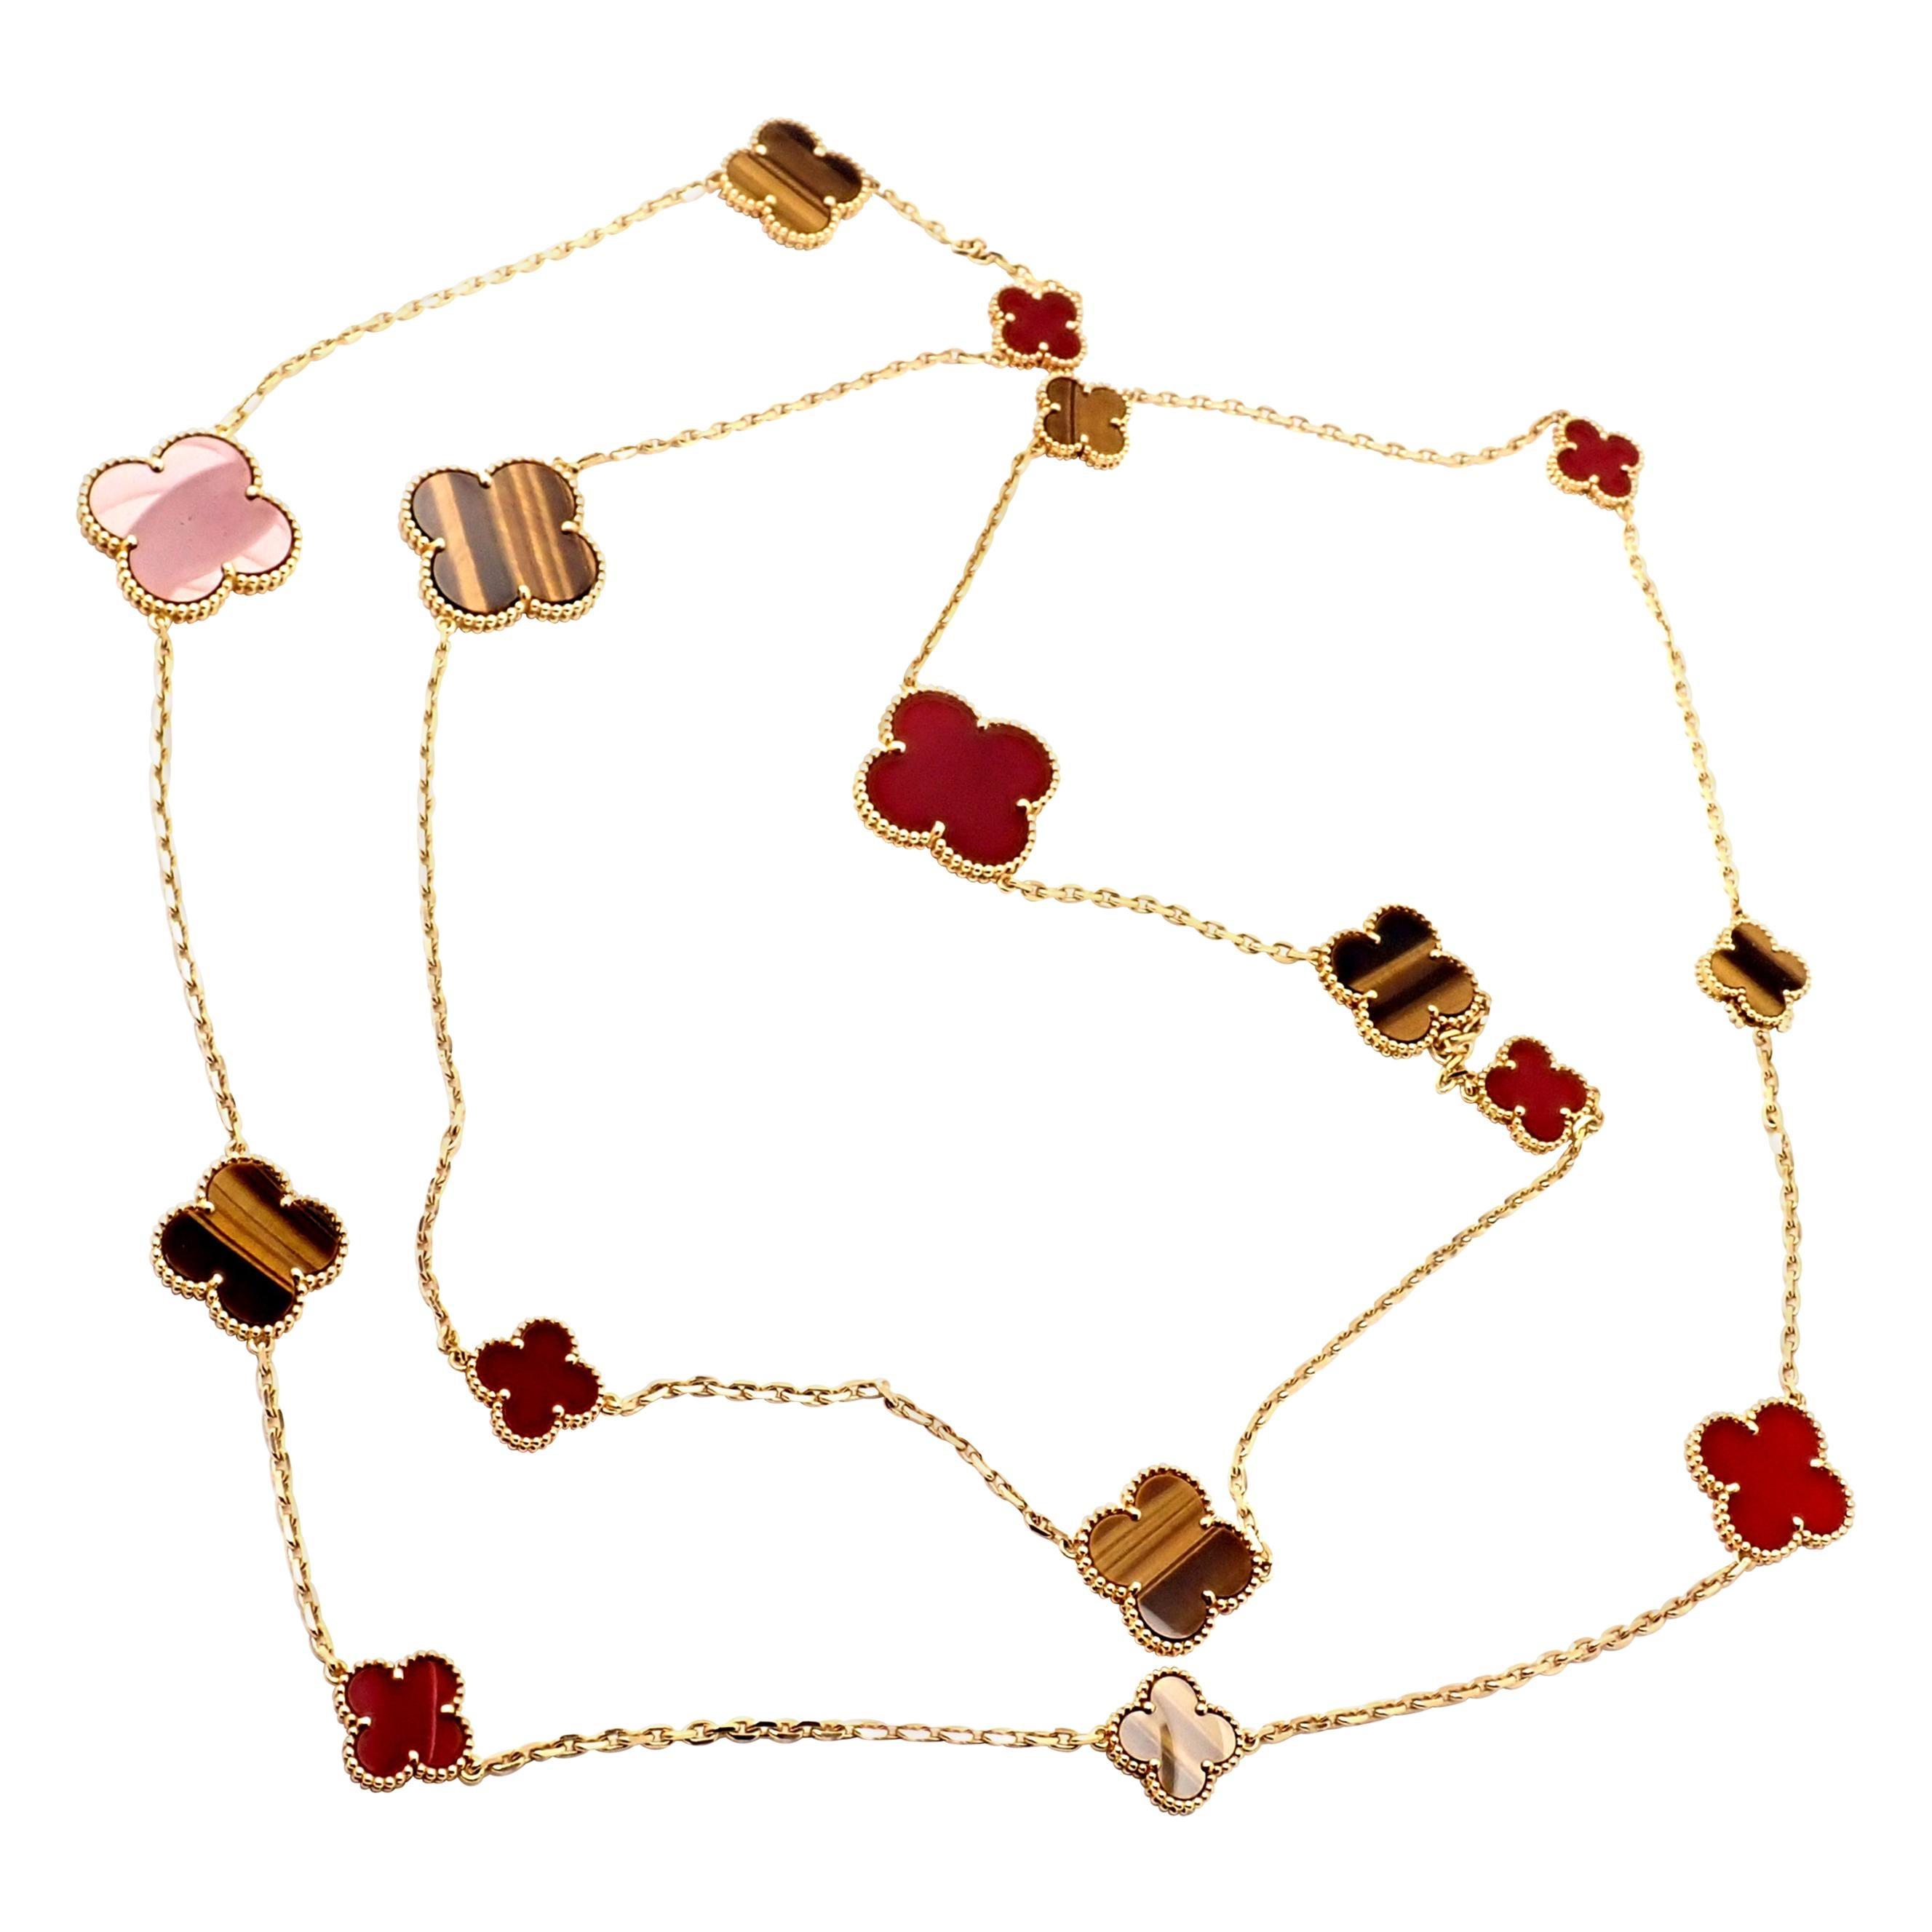 Van Cleef & Arpels Tiger Eye Carnelian 16 Motif Magic Alhambra Gold Necklace